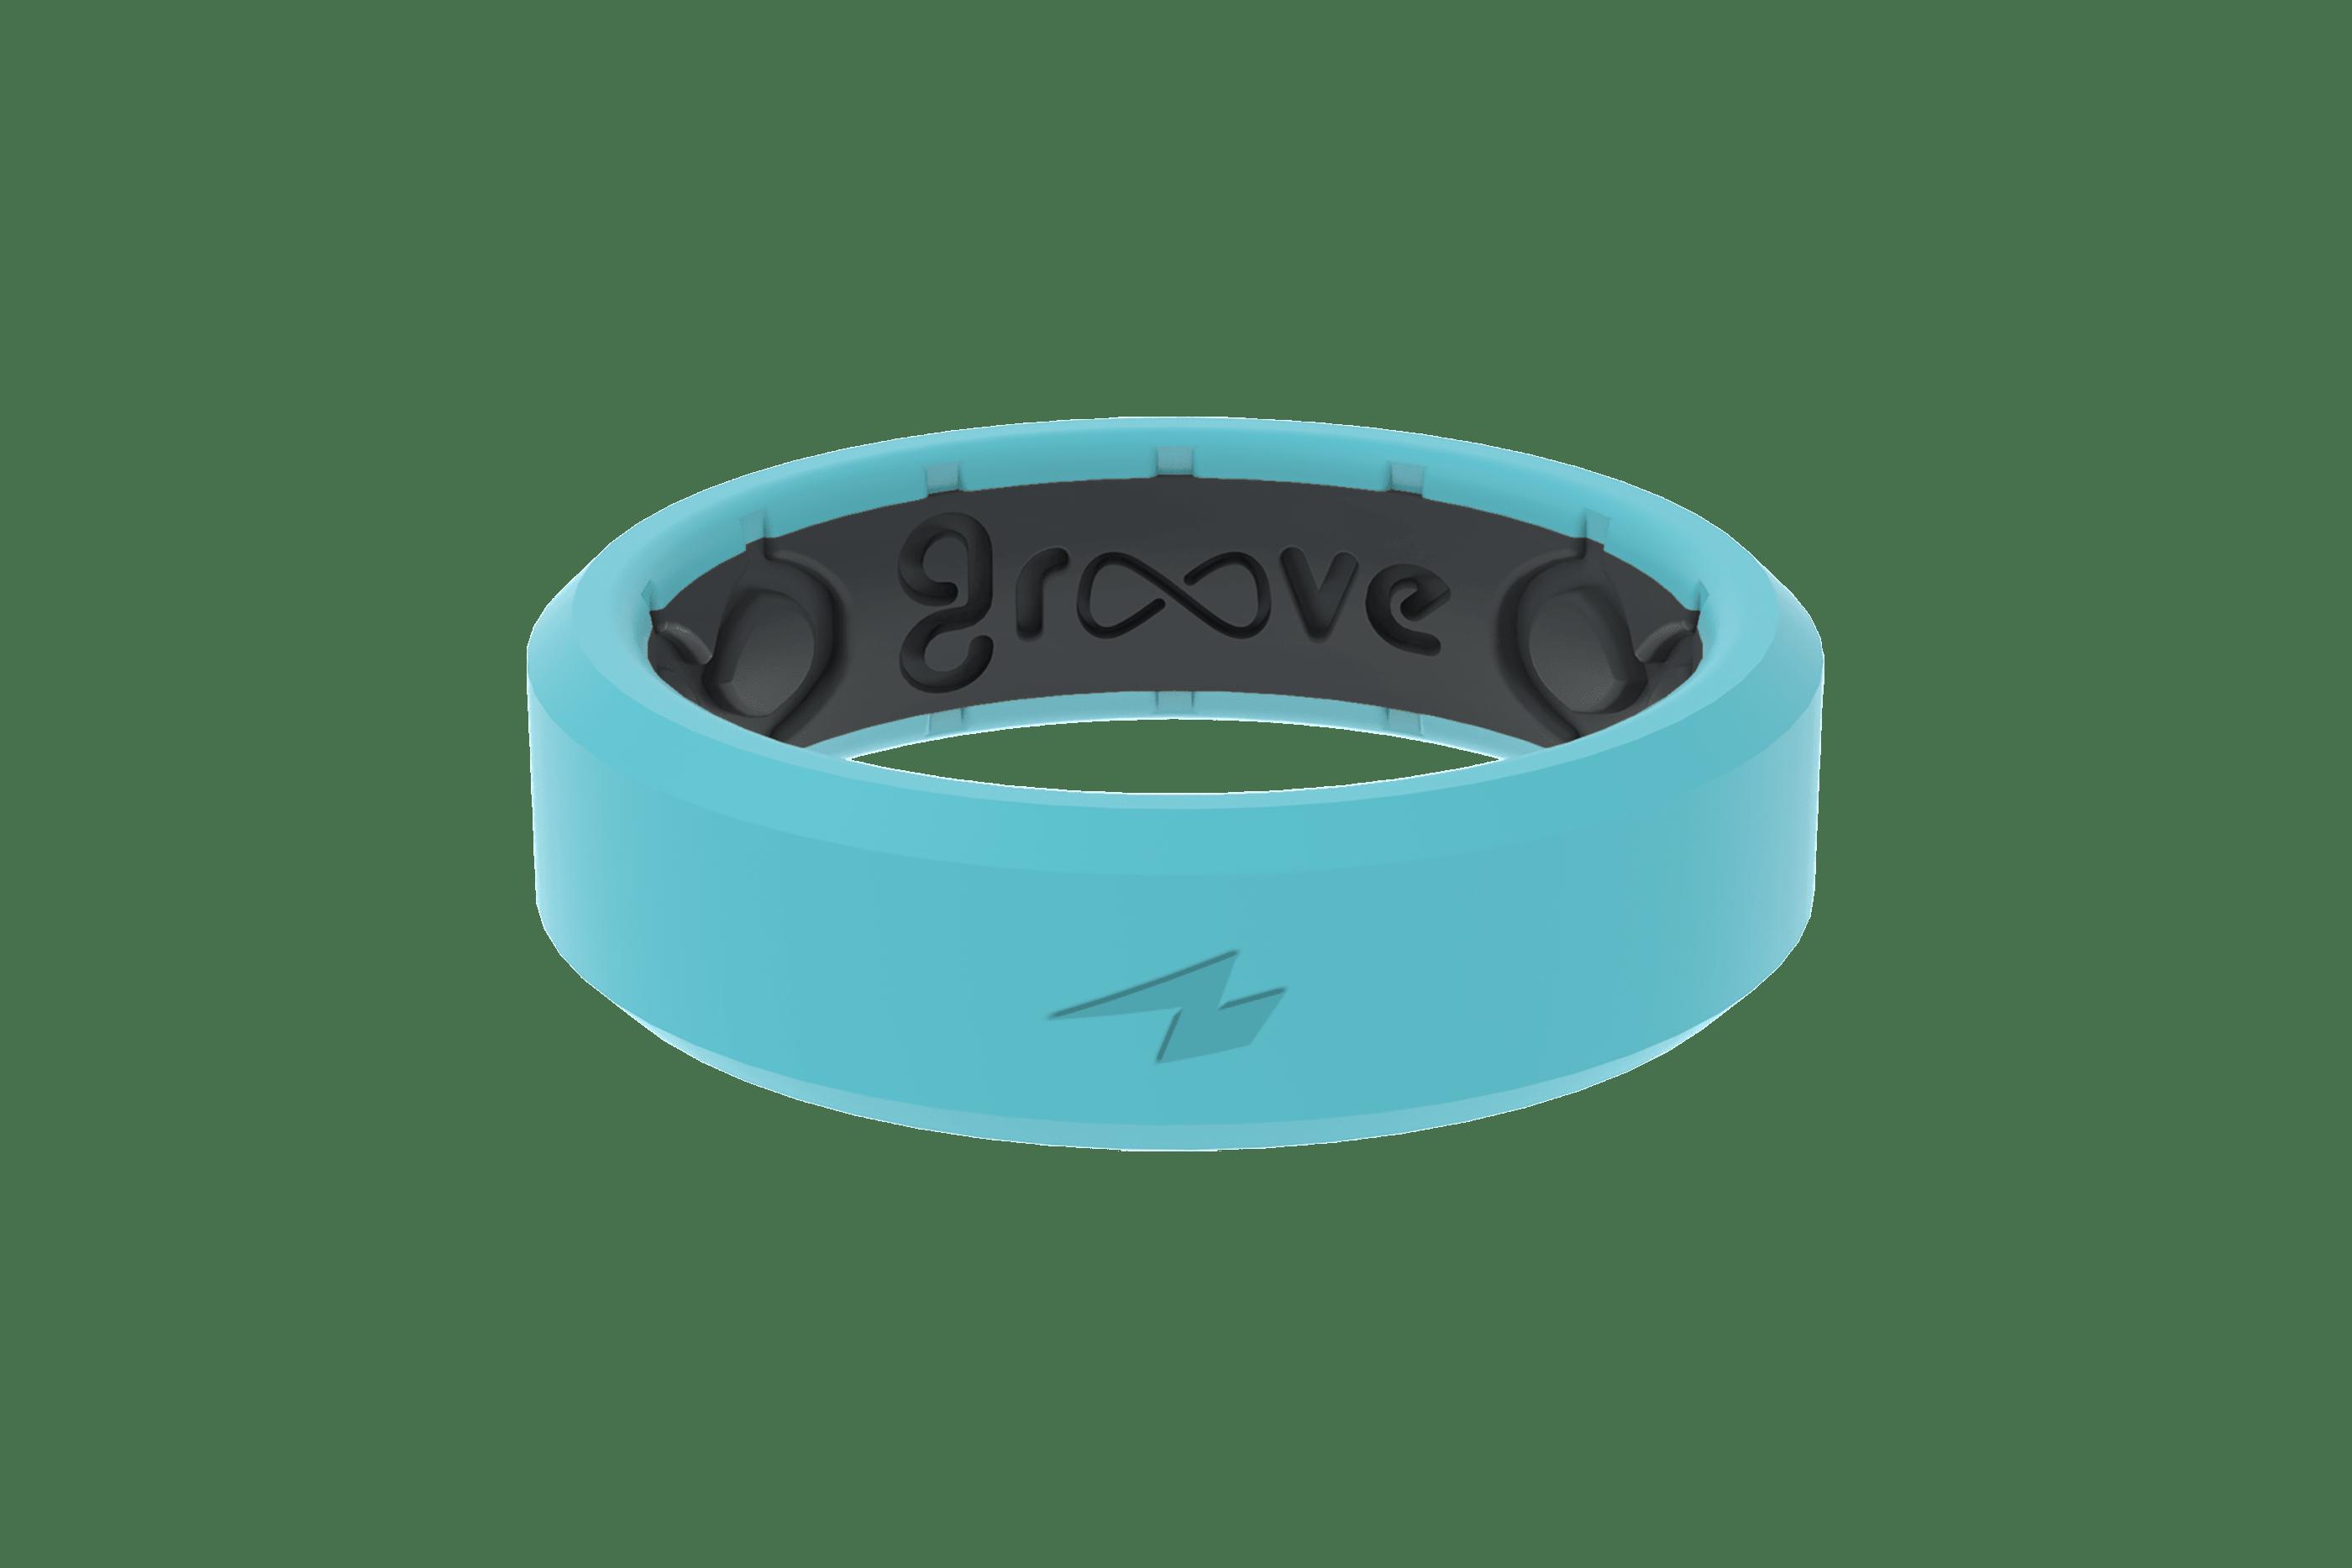 Thin Zeus Aqua/Black - Groove Life Silicone Wedding Rings